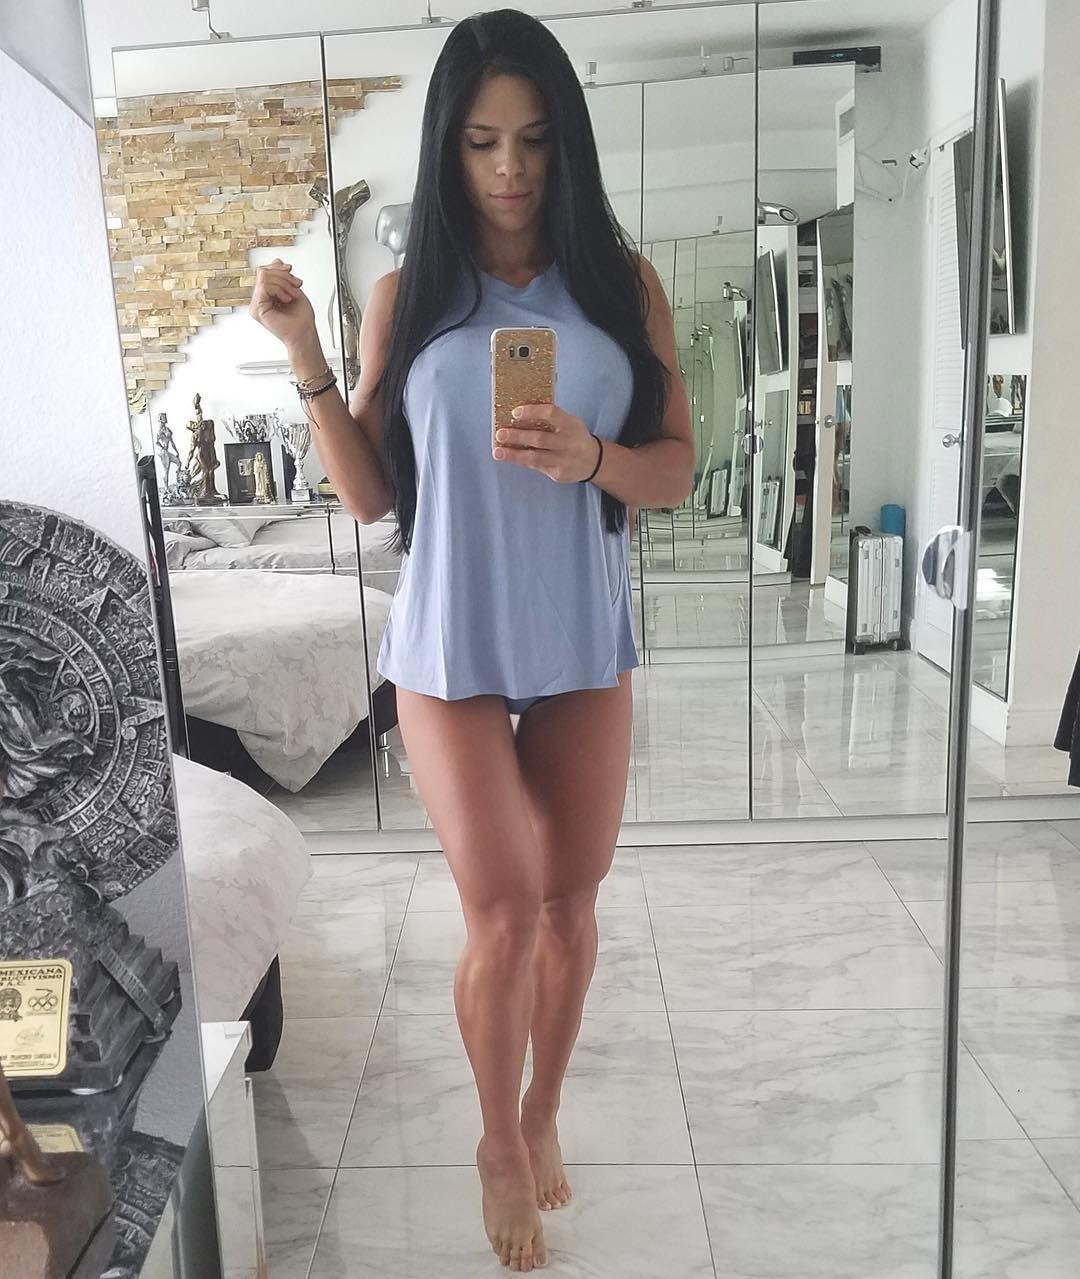 crushphoto-nude-teen-pics-videos-dokterporno